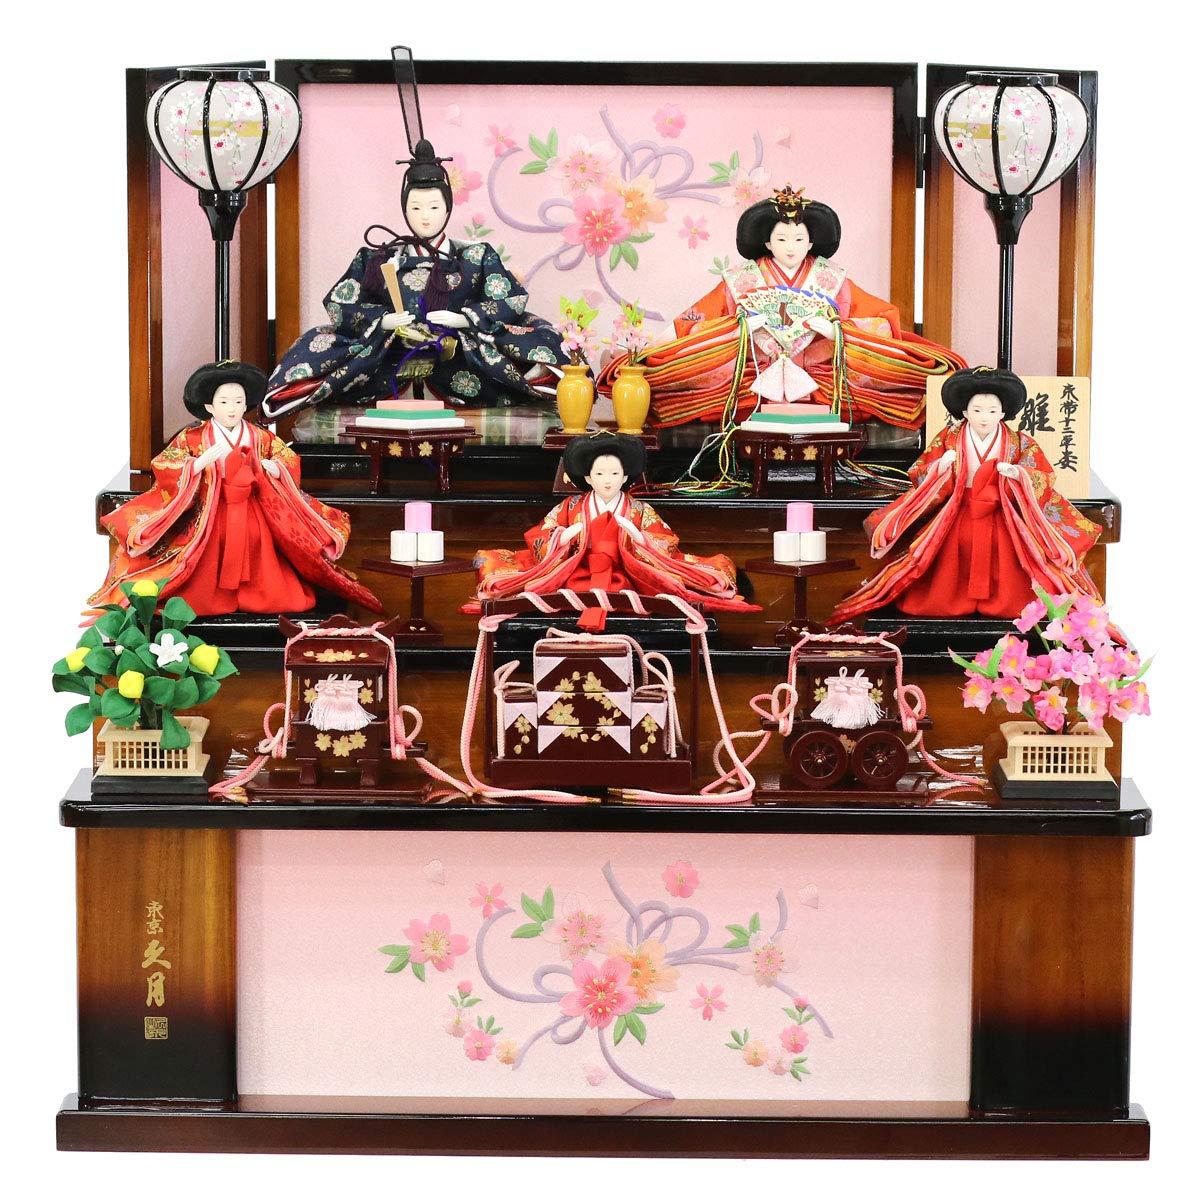 雛人形 久月 収納三段飾り 小三五親王 五人飾り HNQ-S-31237M 人形の久月   B07MFV3L6V